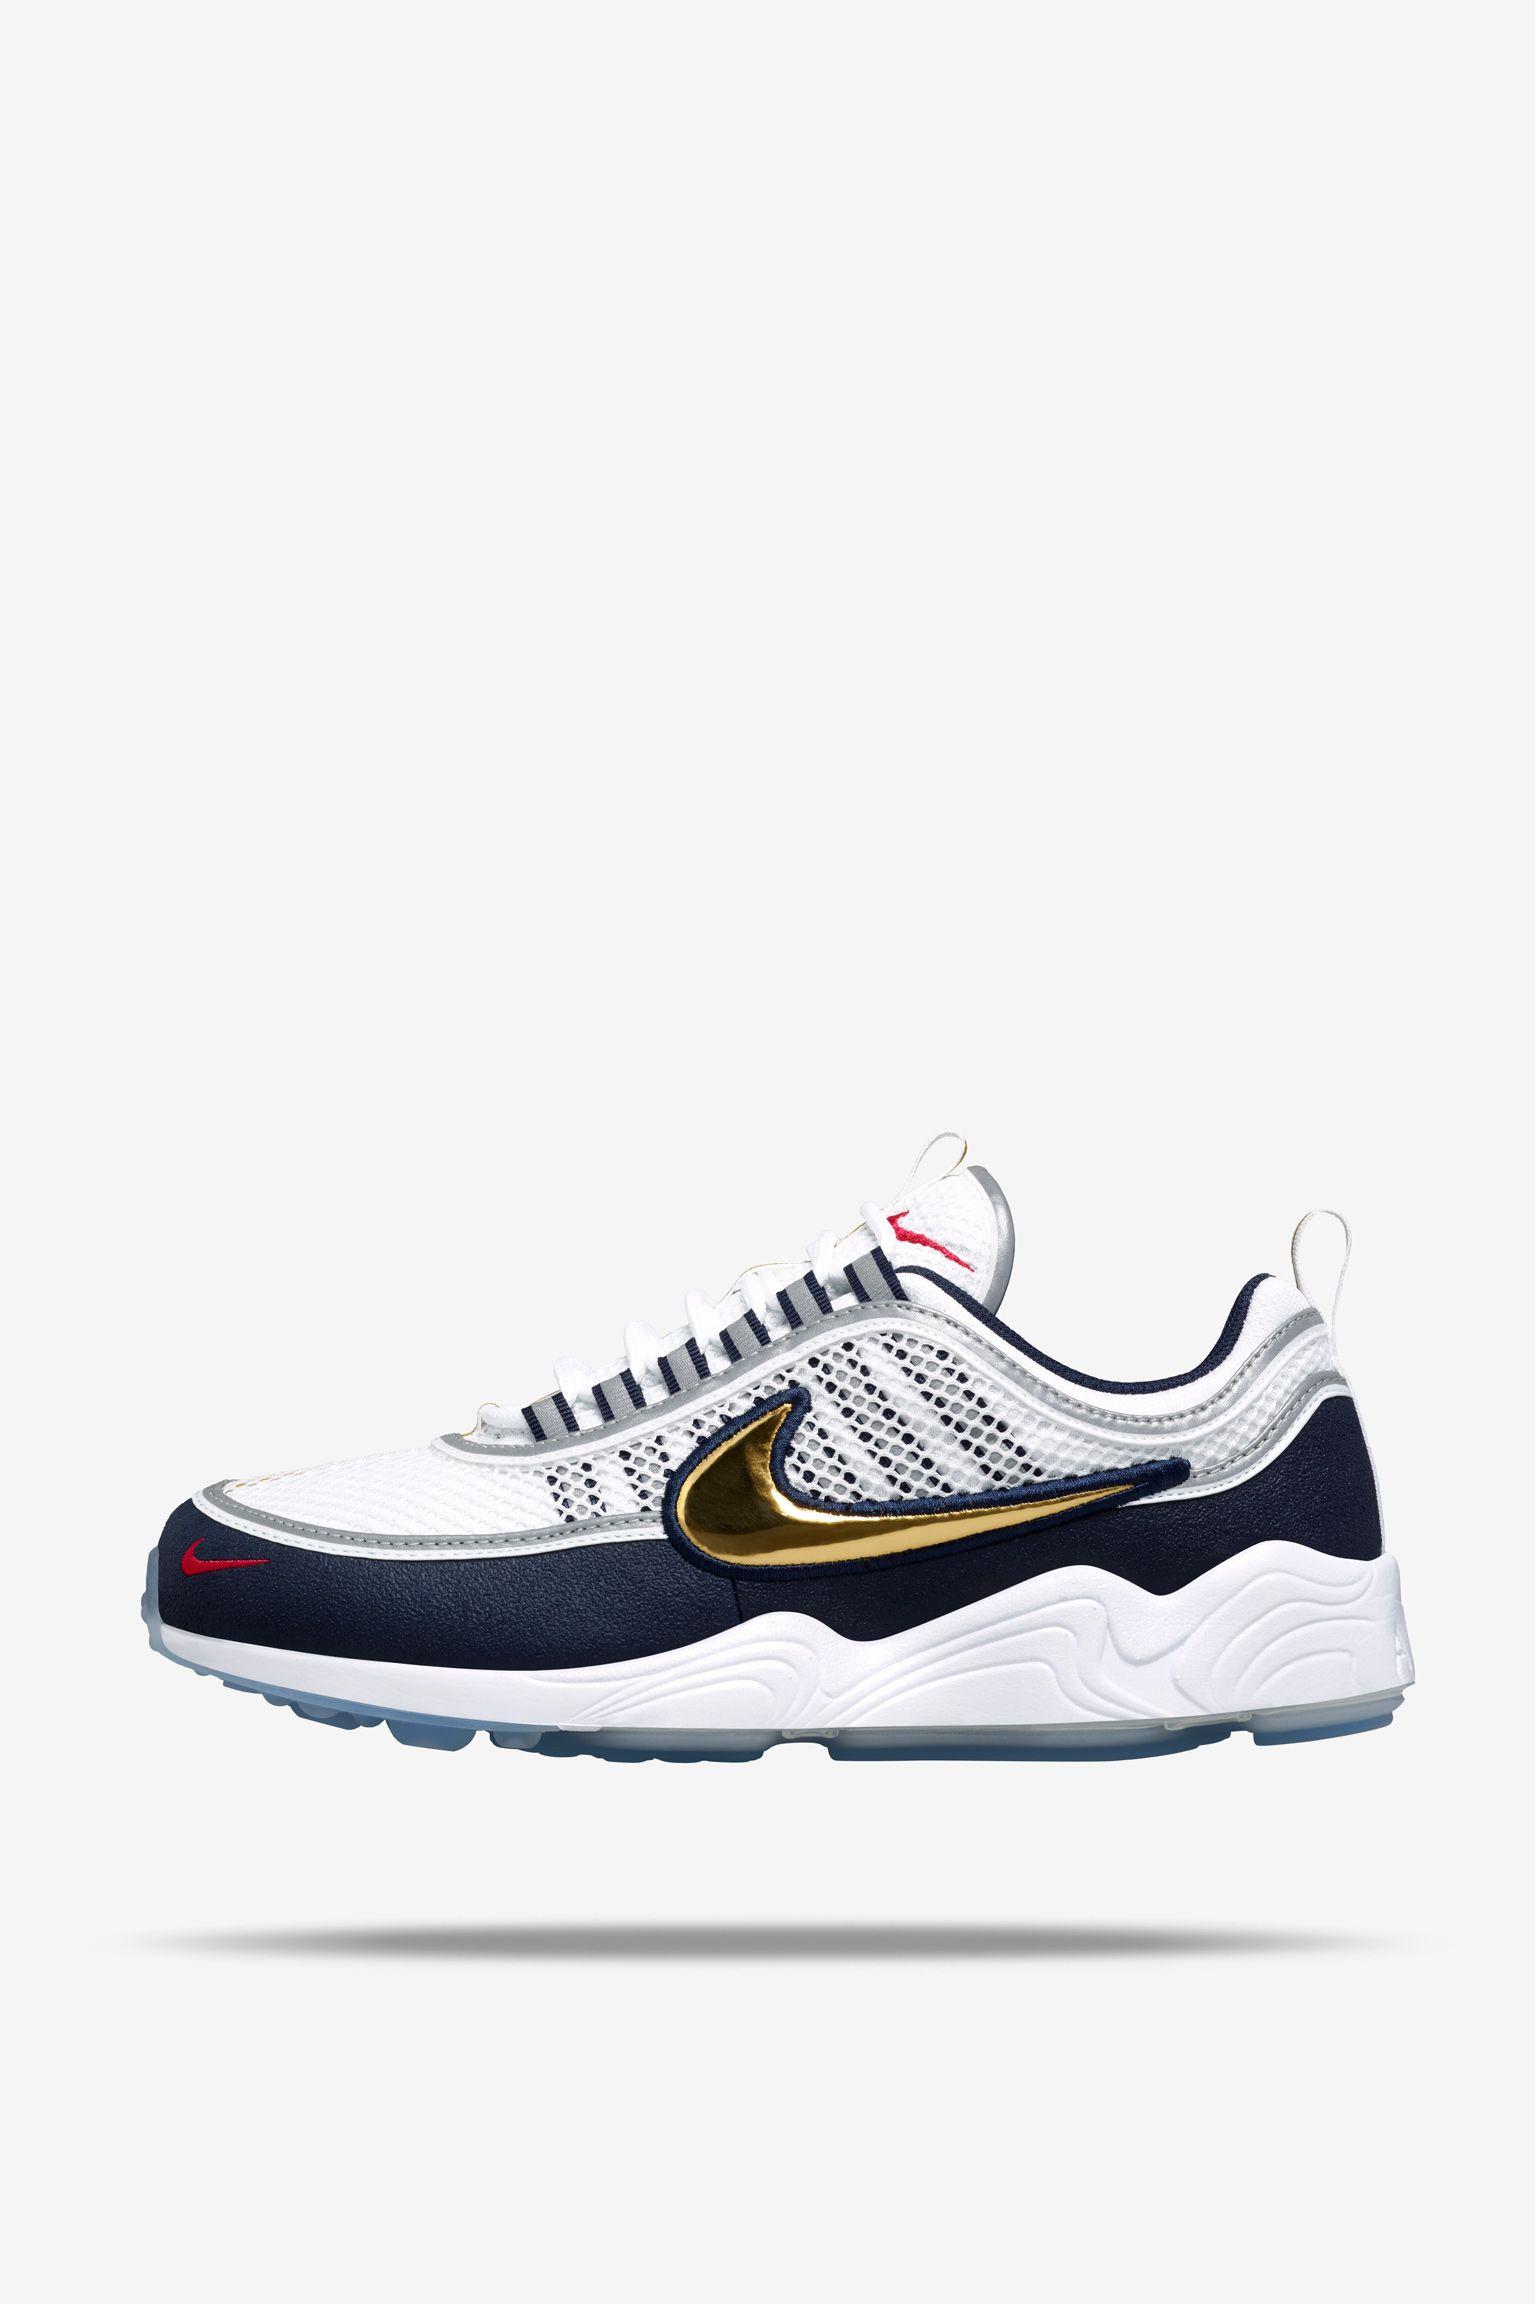 NikeLab Air Zoom Spiridon 'White & Gold' Release Date